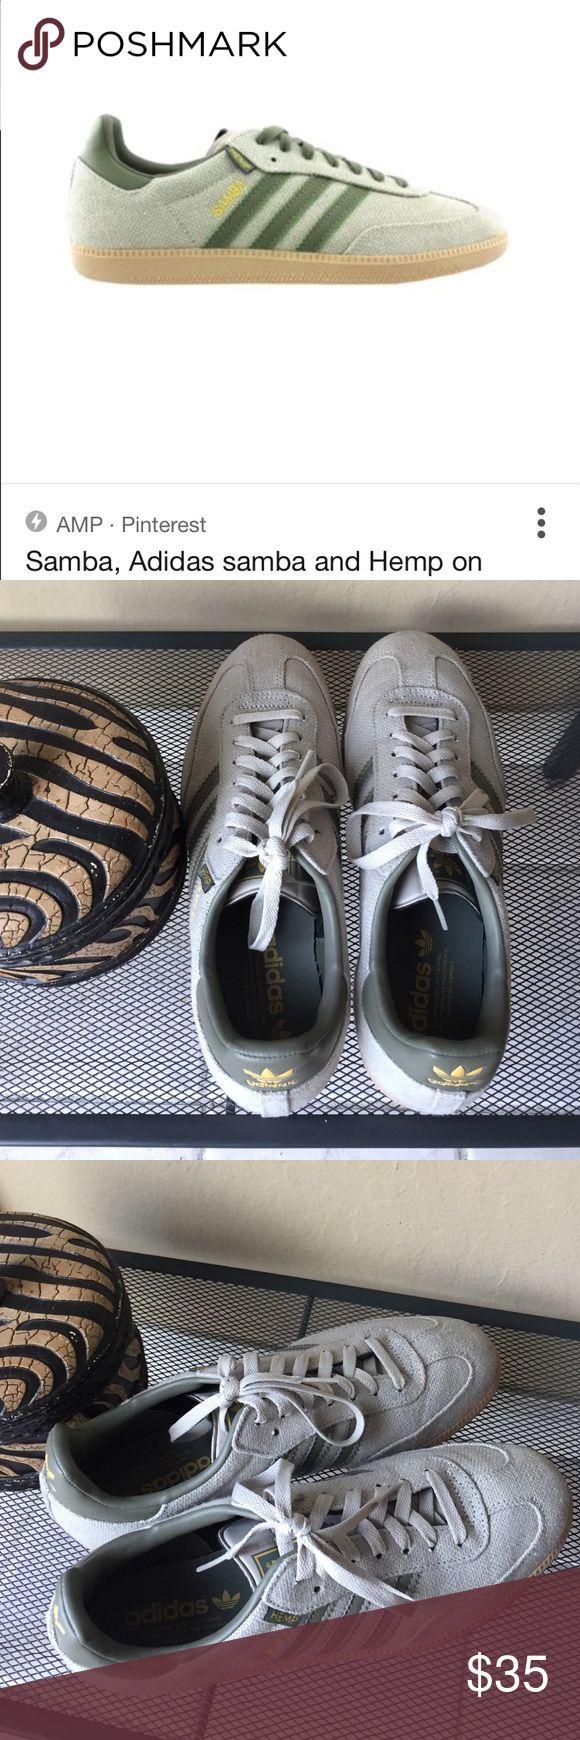 Mens Adidas Hemp Samba Adidas Hemp Samba. 3 stripes. Like brand new Adidas Shoes Sneakers